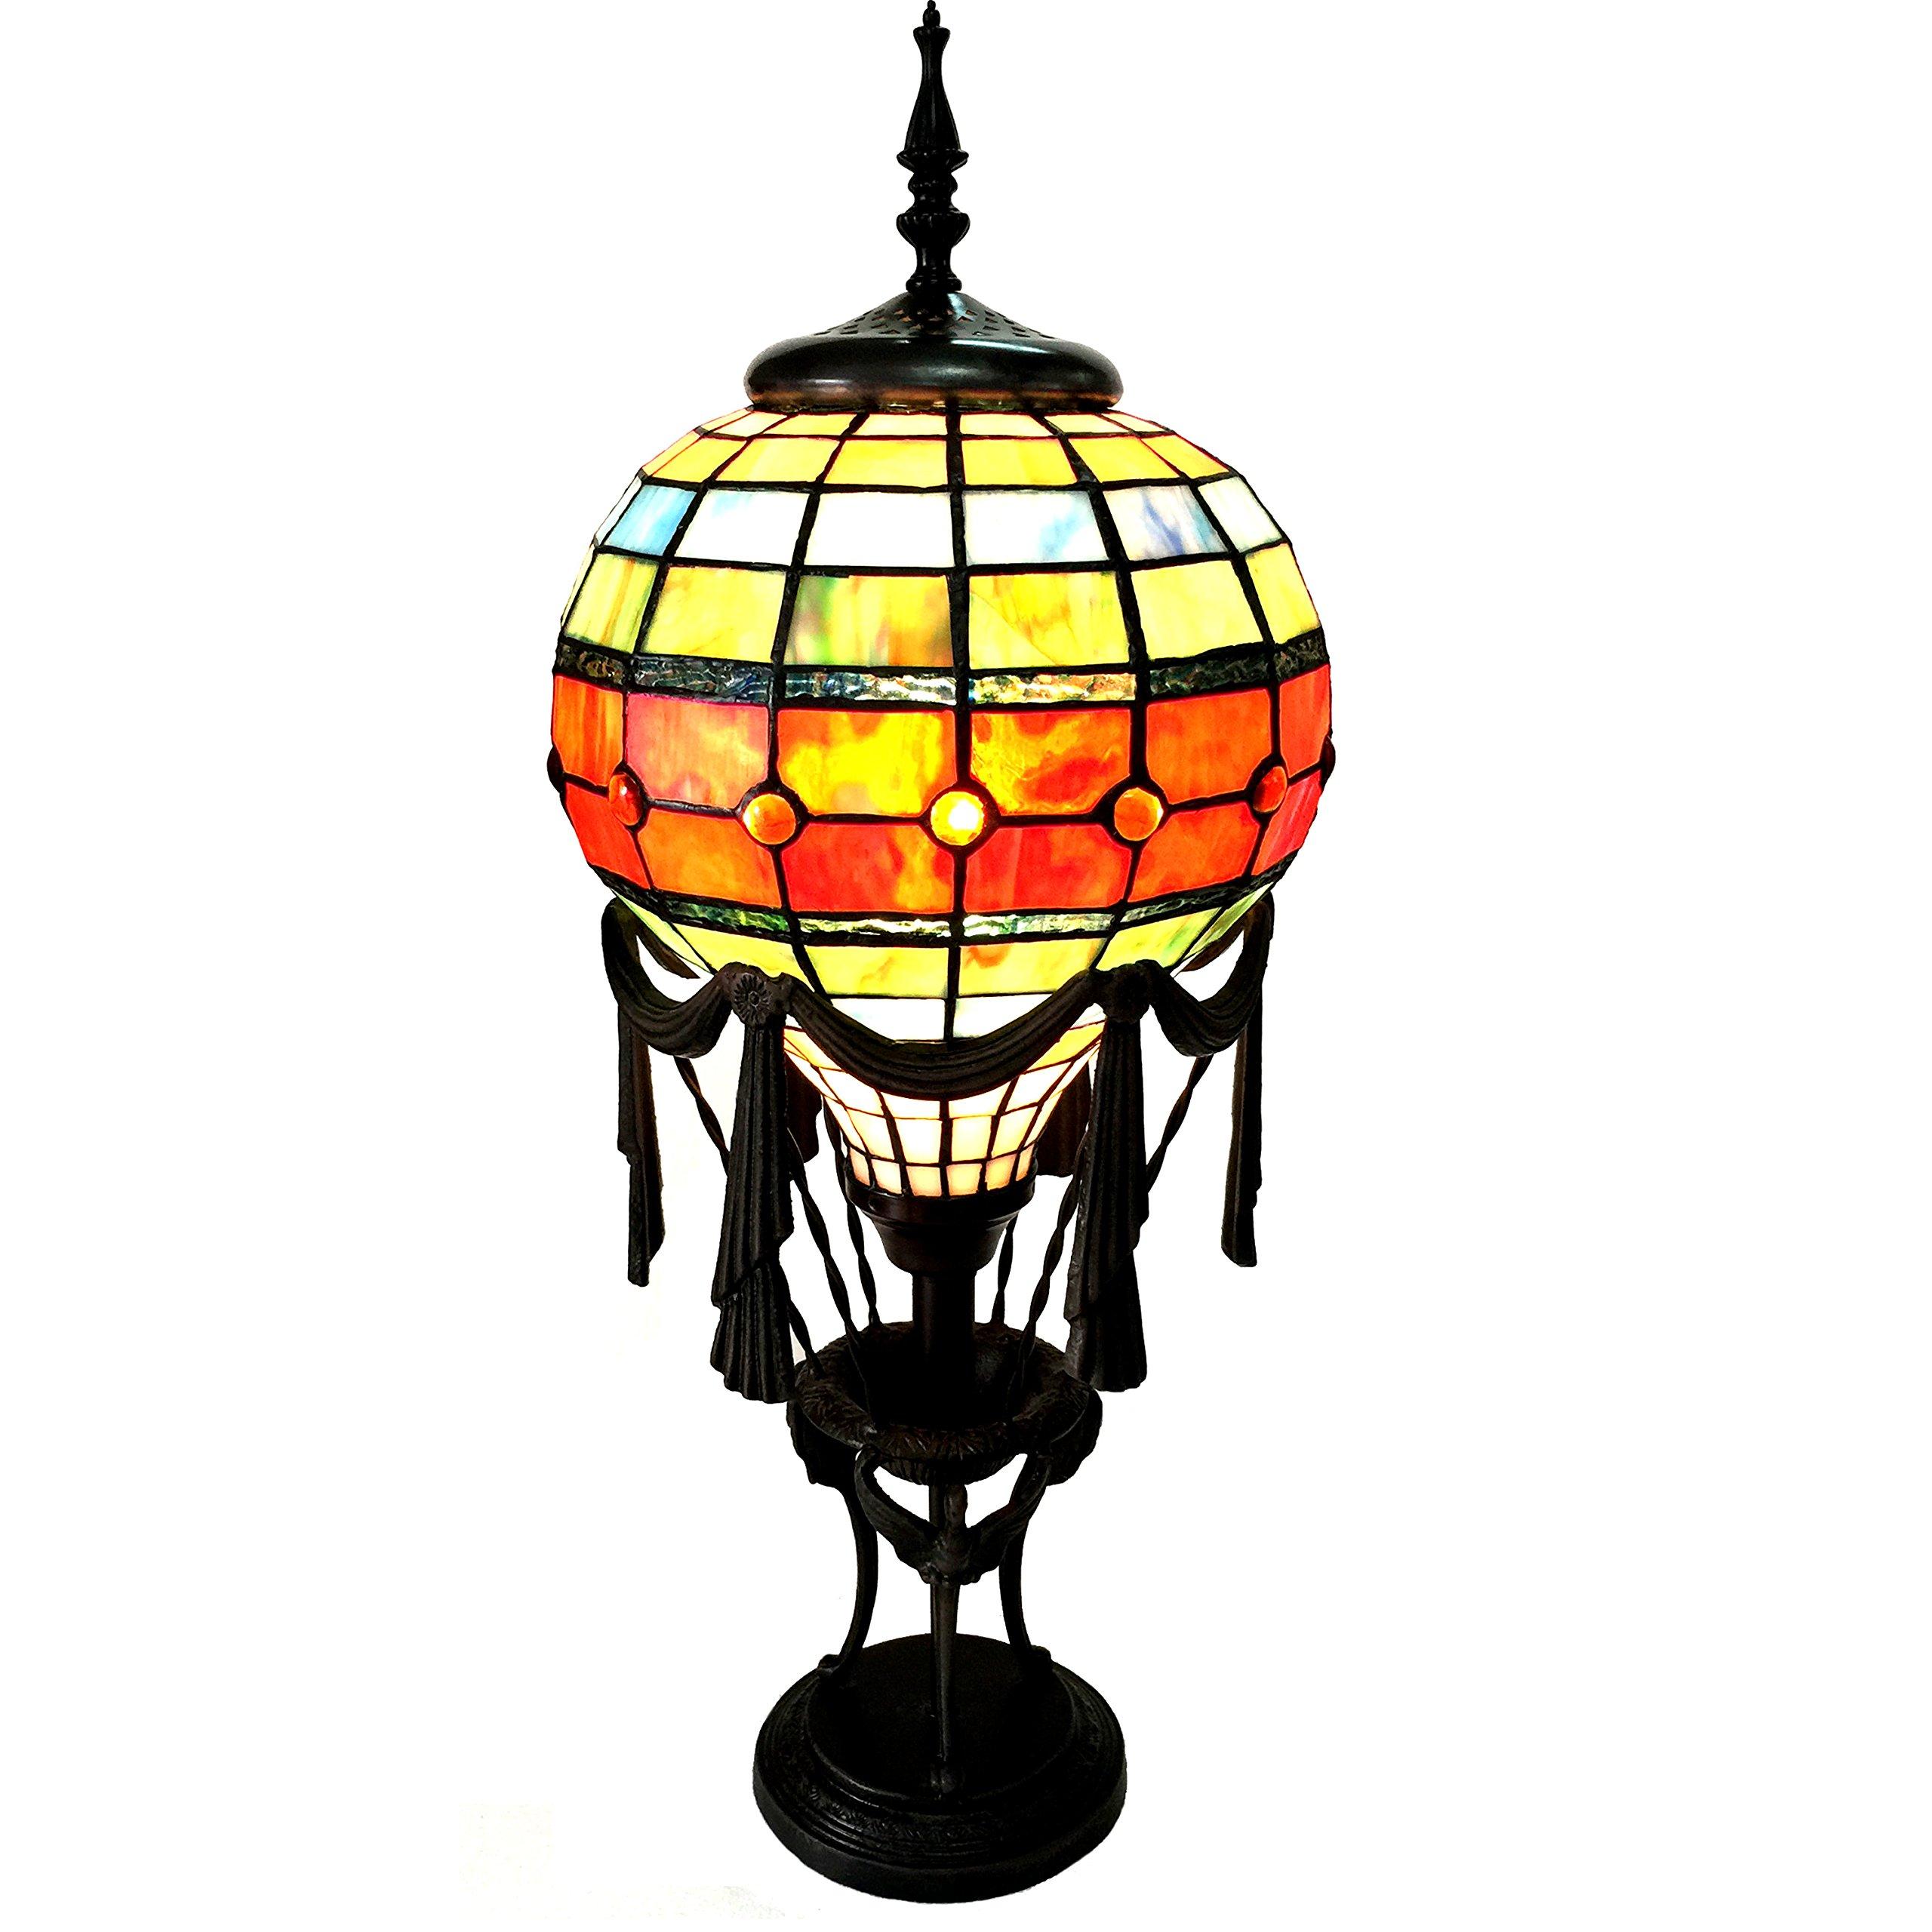 Chloe Lighting CH15692GM11-TL1 Rozier Tiffany-Style 1 Table Lamp 11'' Shade 1 Light by Chloe Lighting